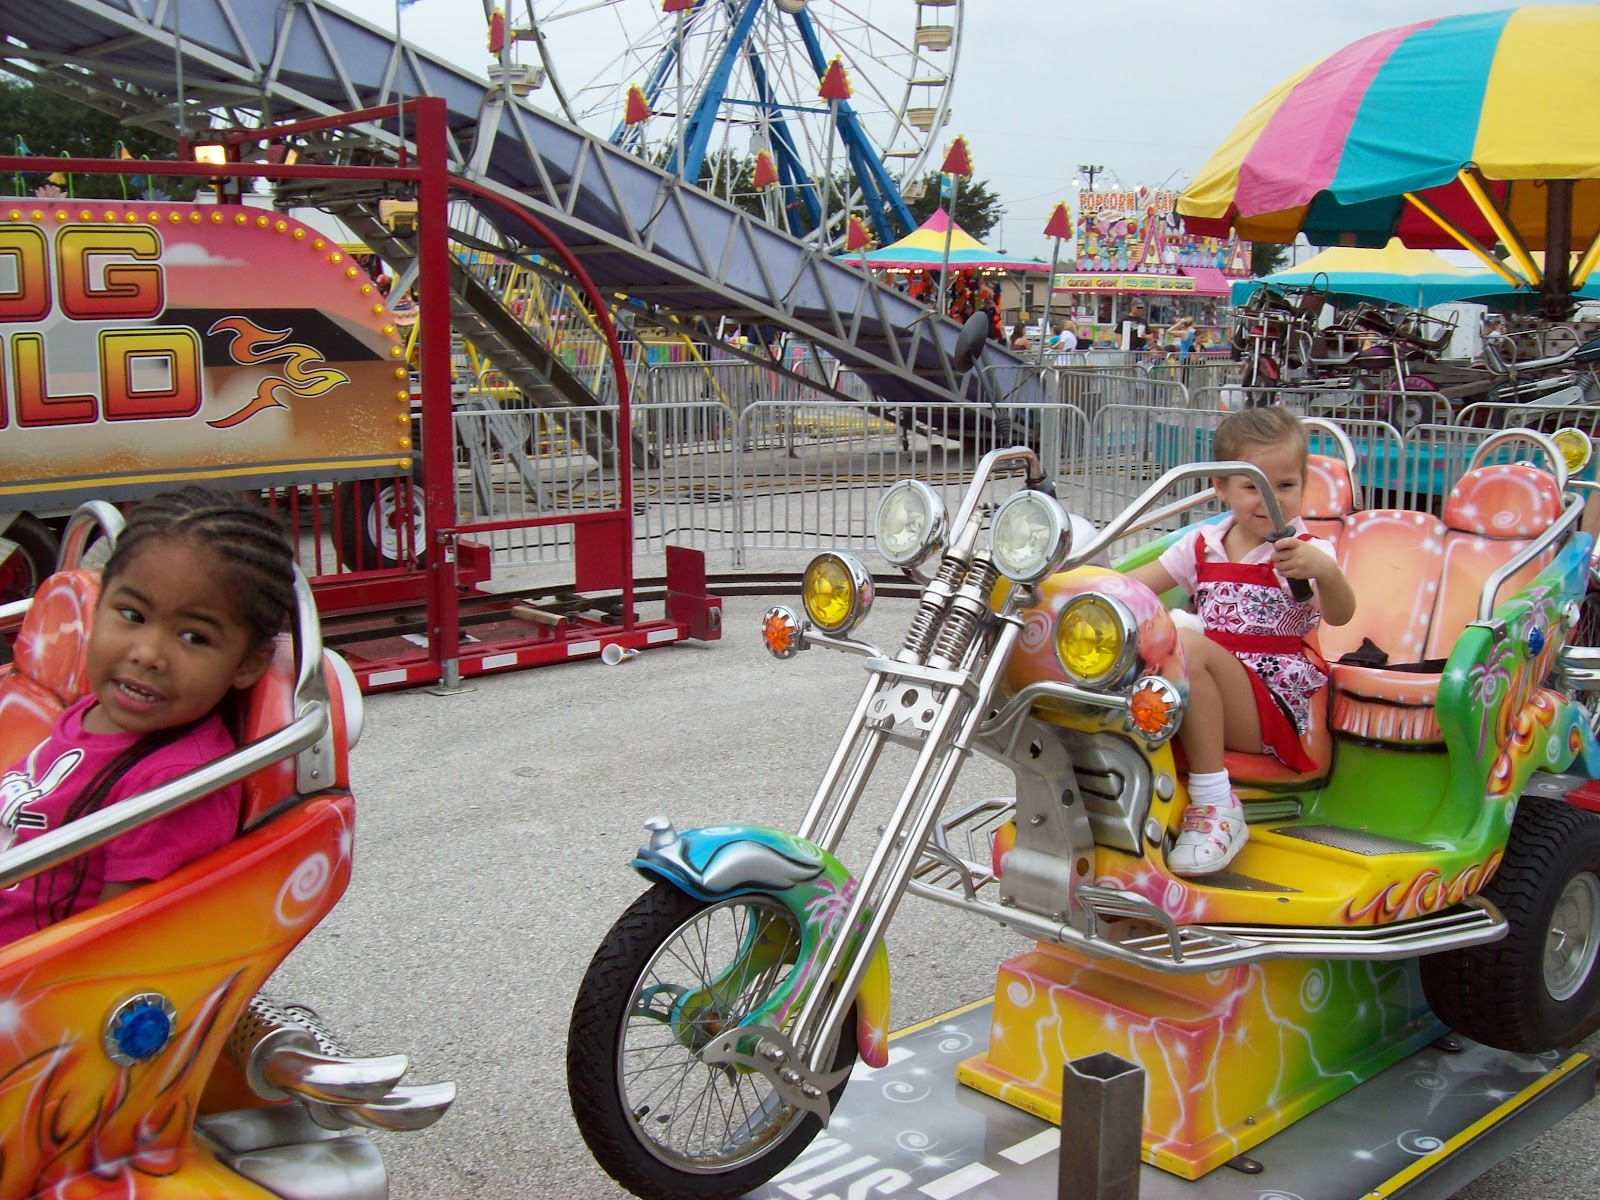 Fort Bend County Fair - 101_5587.JPG